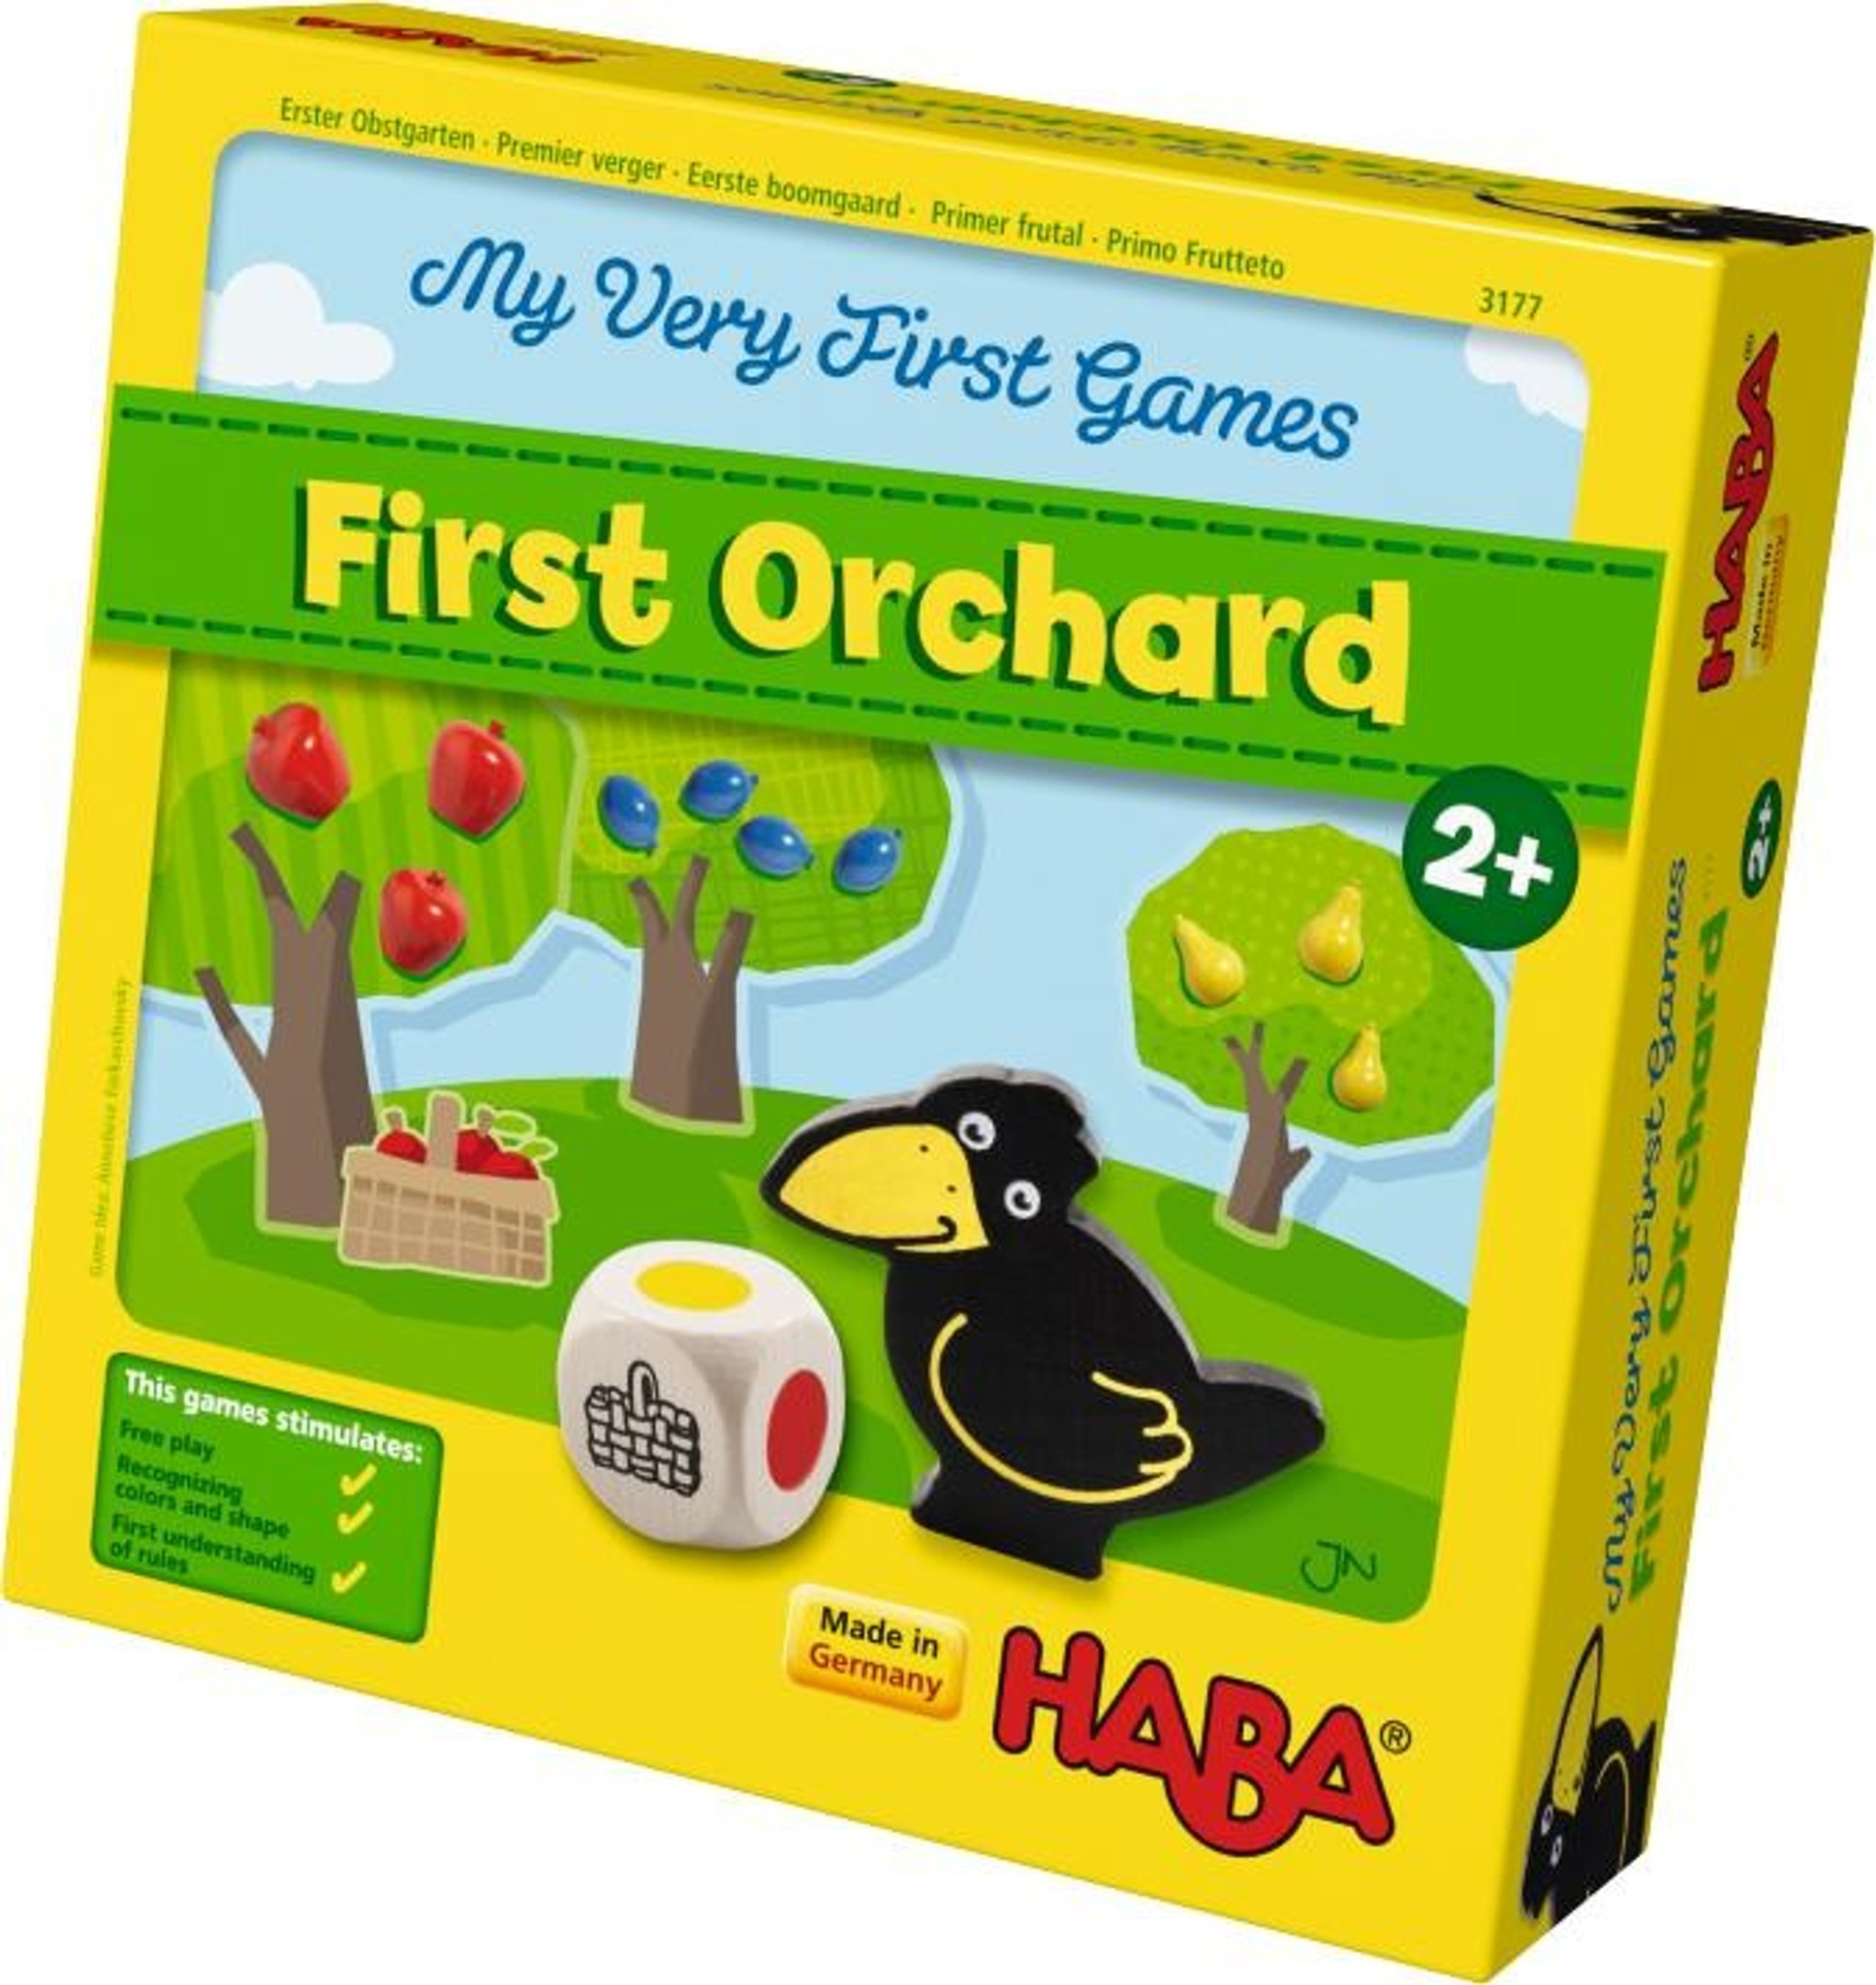 HABA My first Orchard - HABA Games Canada